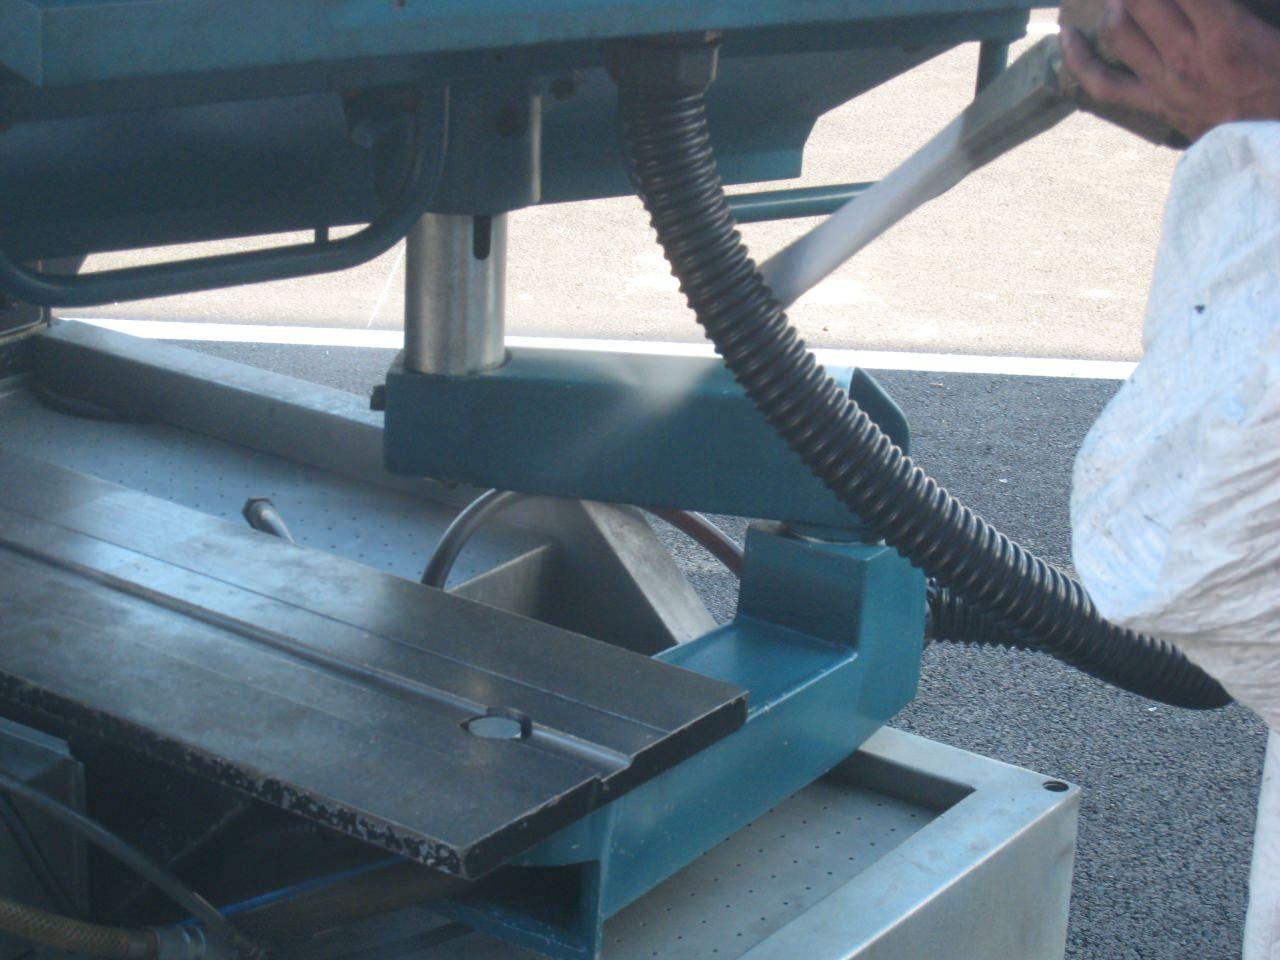 Nettoyage industriel cryog nie et d capage par a rogommage - Aerogommage prix machine ...